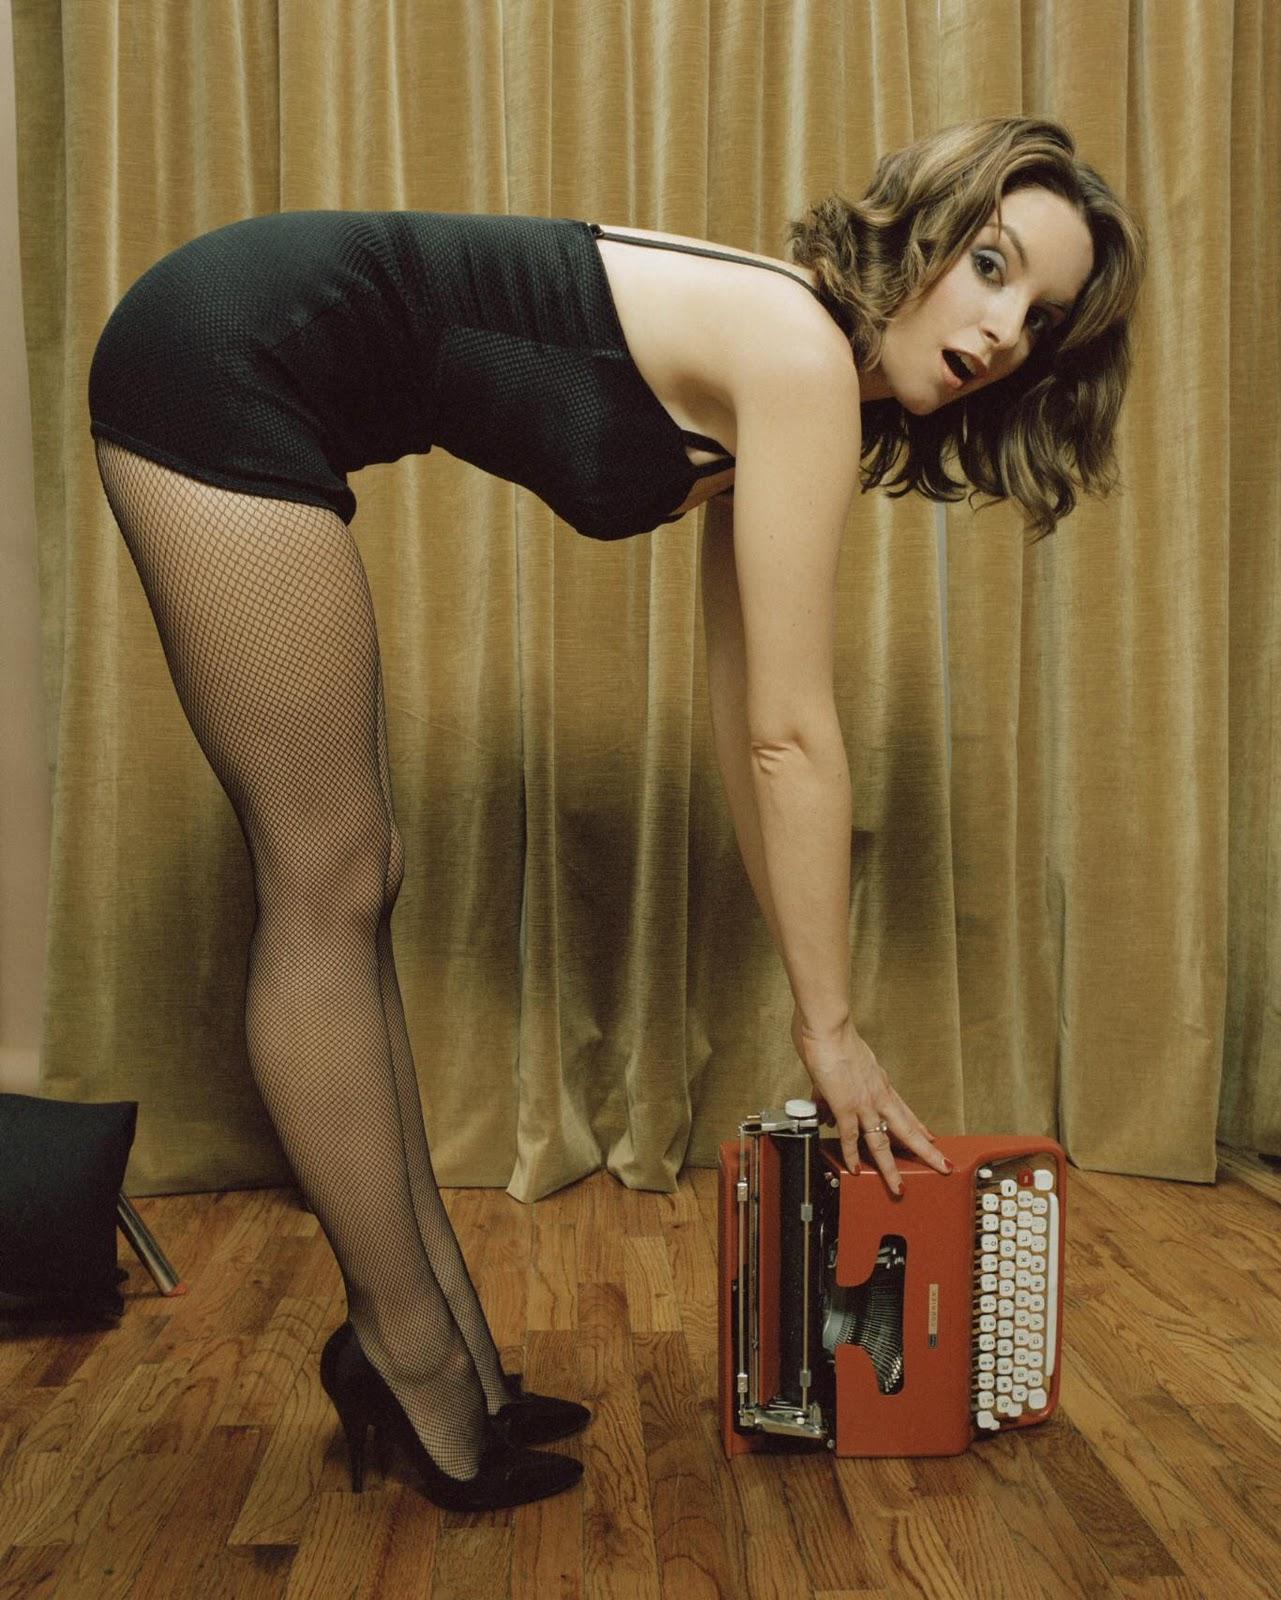 Sarah silverman sex against the wall on scandalplanetcom 2